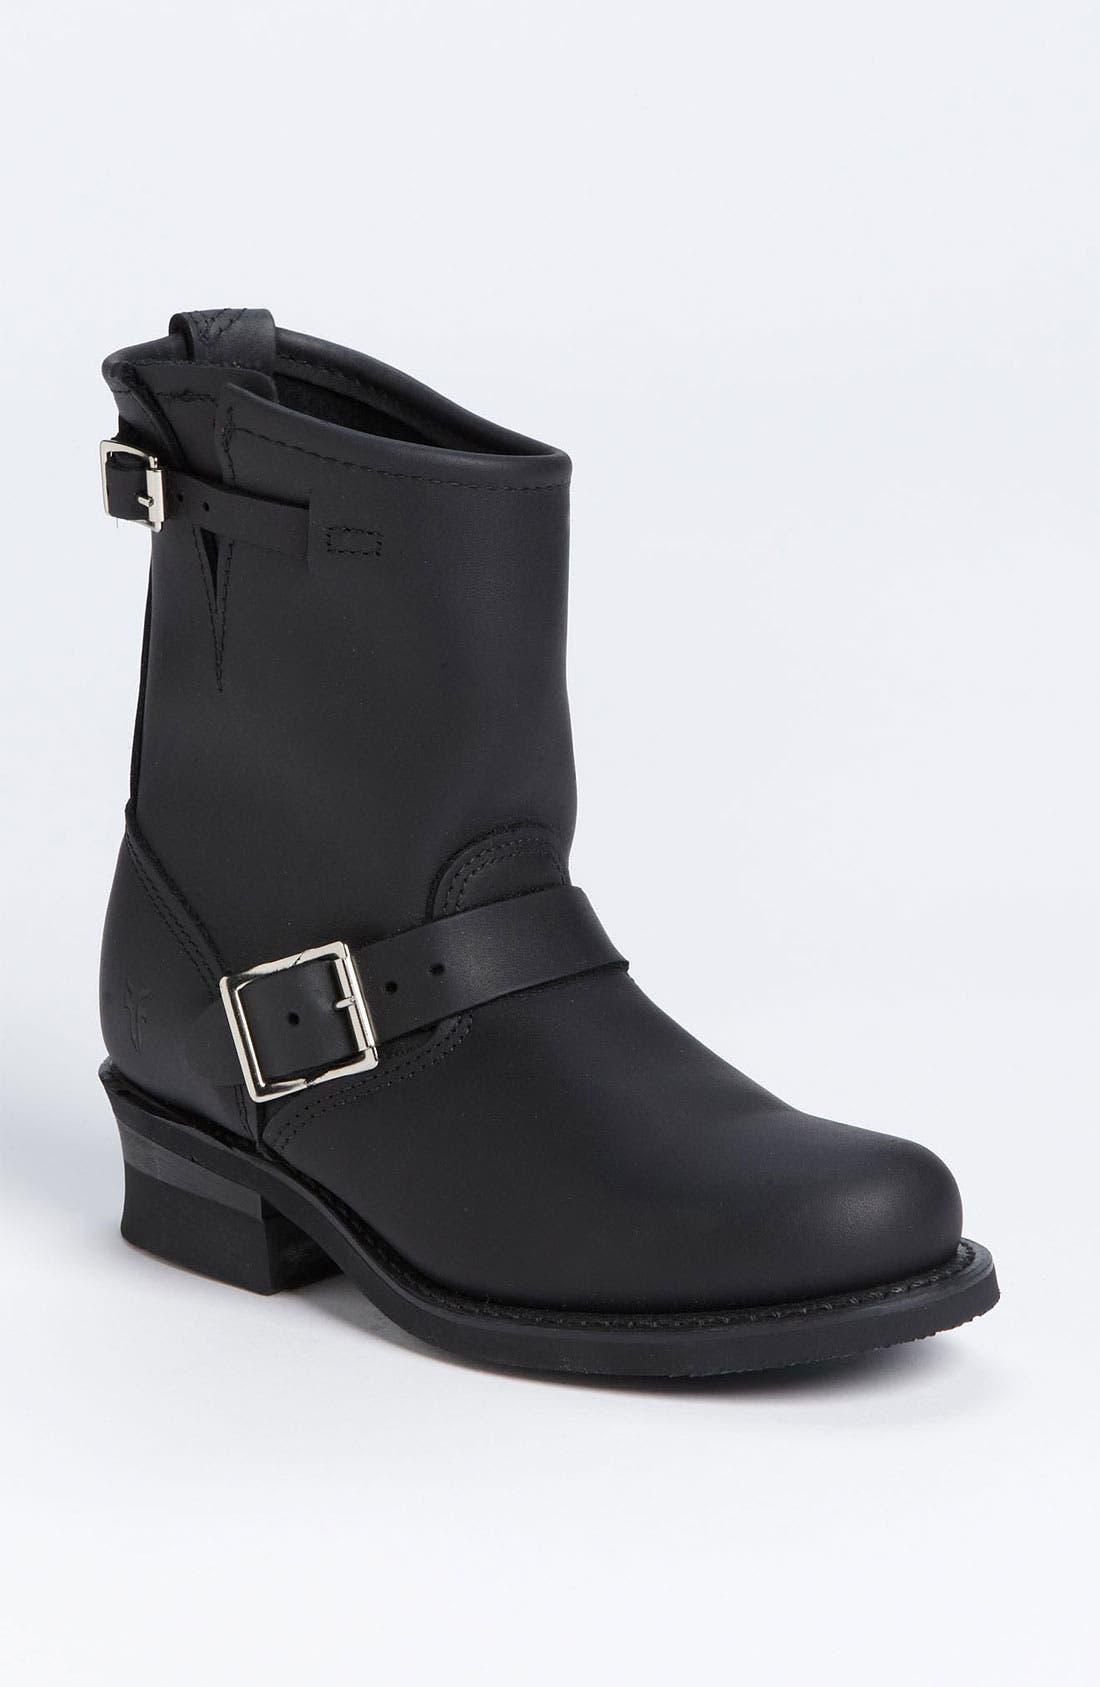 42877f62149 Frye  Engineer 8R  Leather Boot- Black